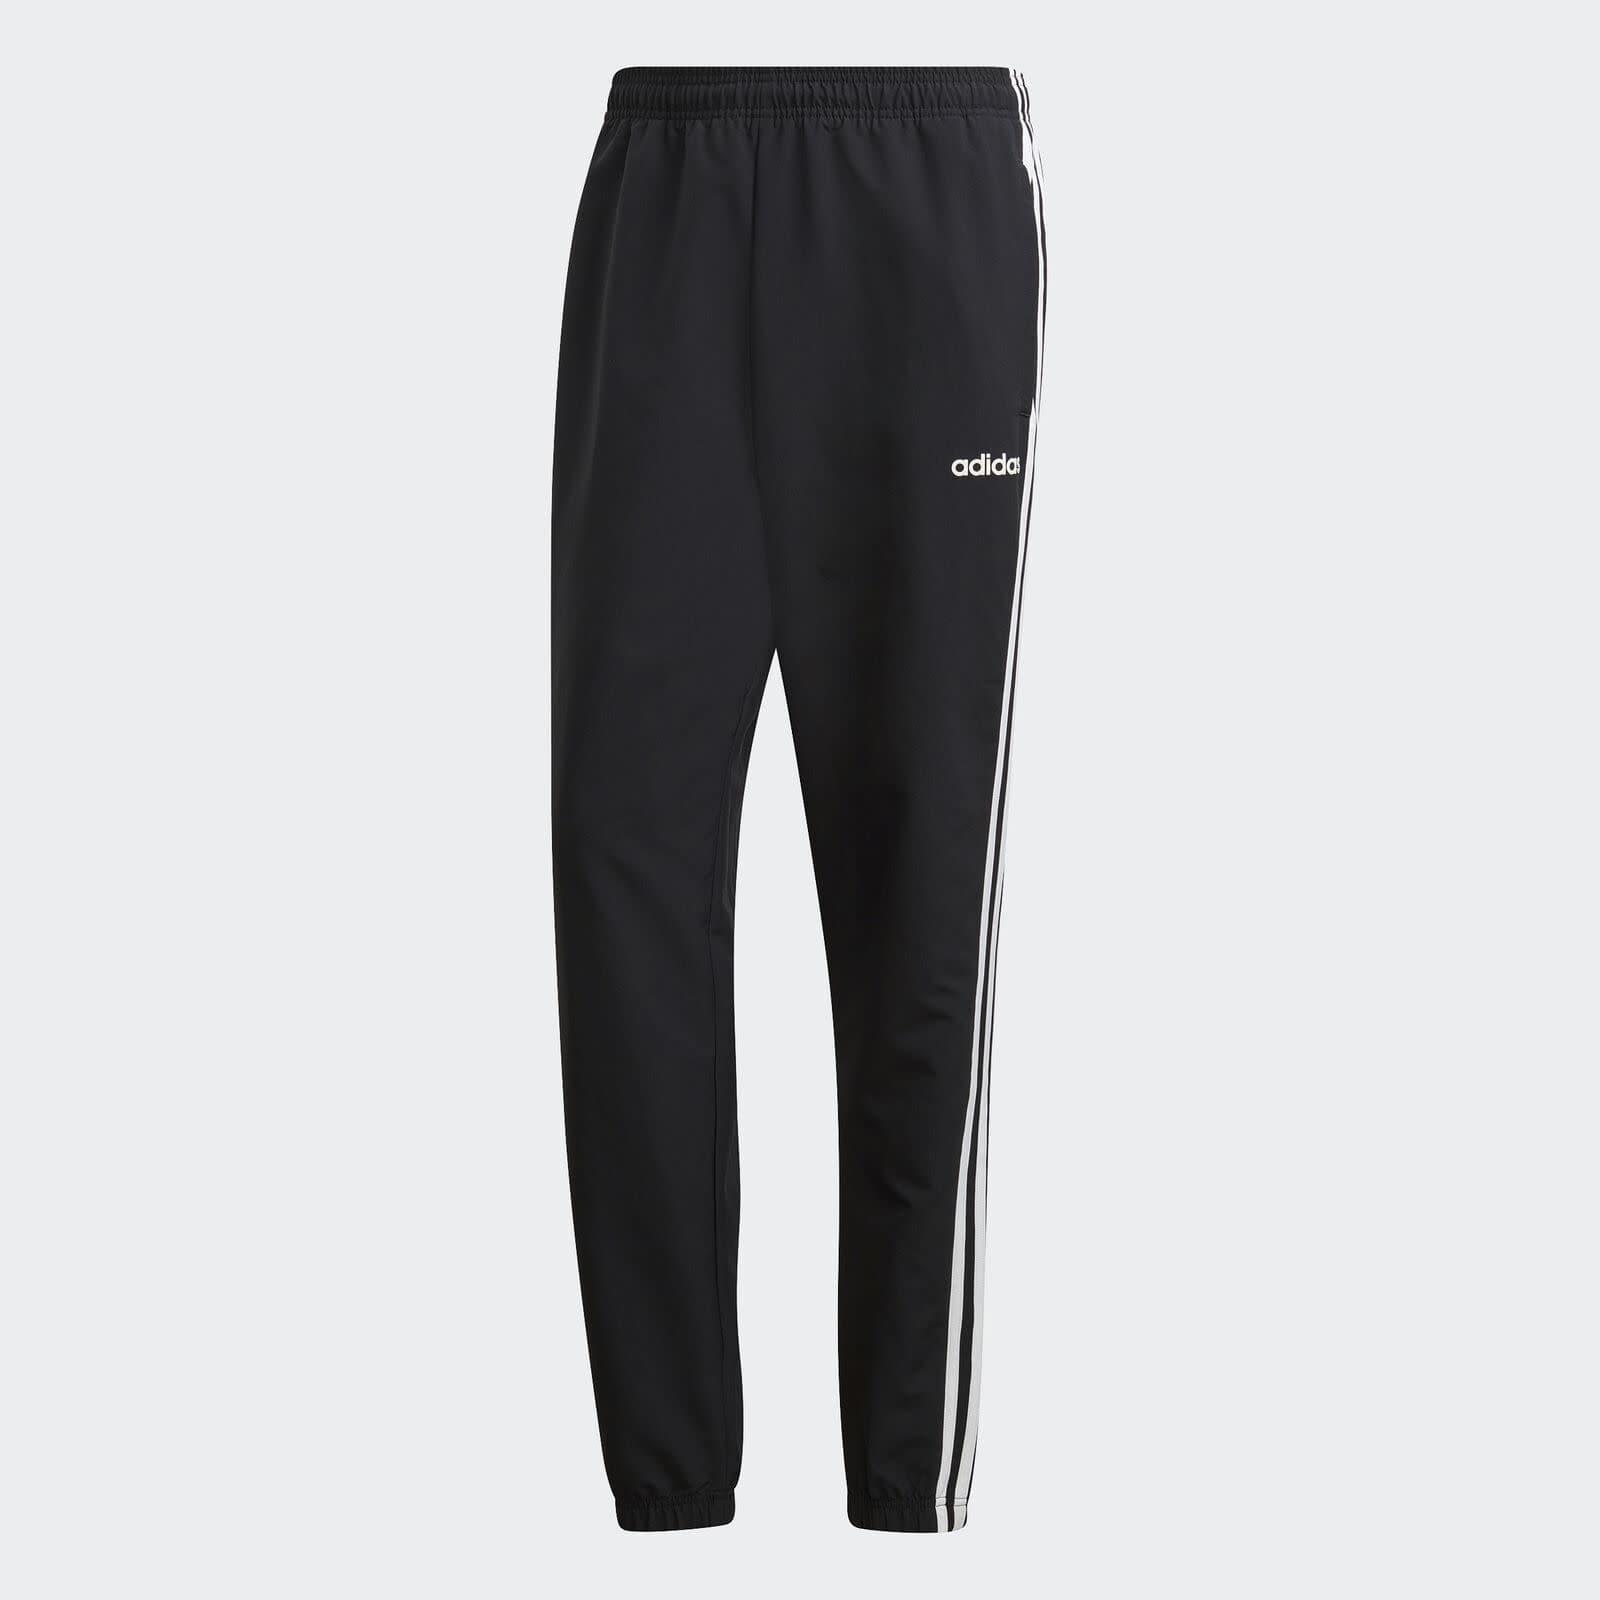 adidas Essentials Men's 3-Stripes Wind Pants